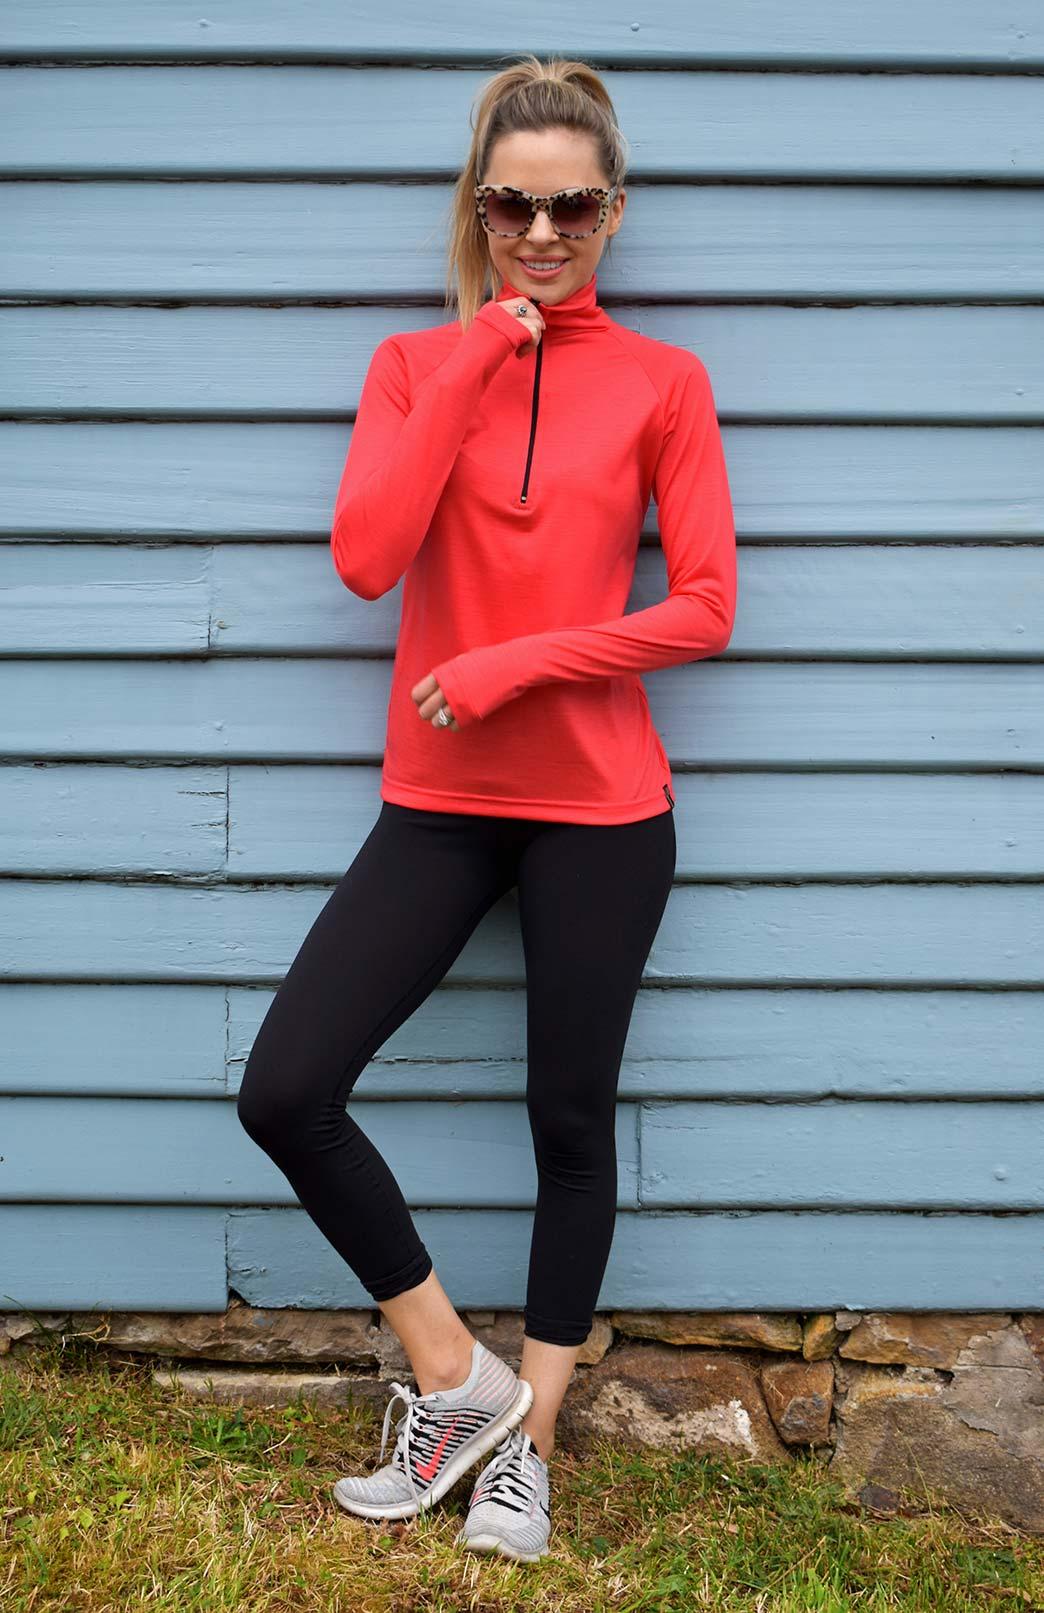 Zip Neck Top - Ultralight (170g) - Women's Hot Coral Ultralight Wool Zip Neck Pullover Style Top with Thumb Holes - Smitten Merino Tasmania Australia